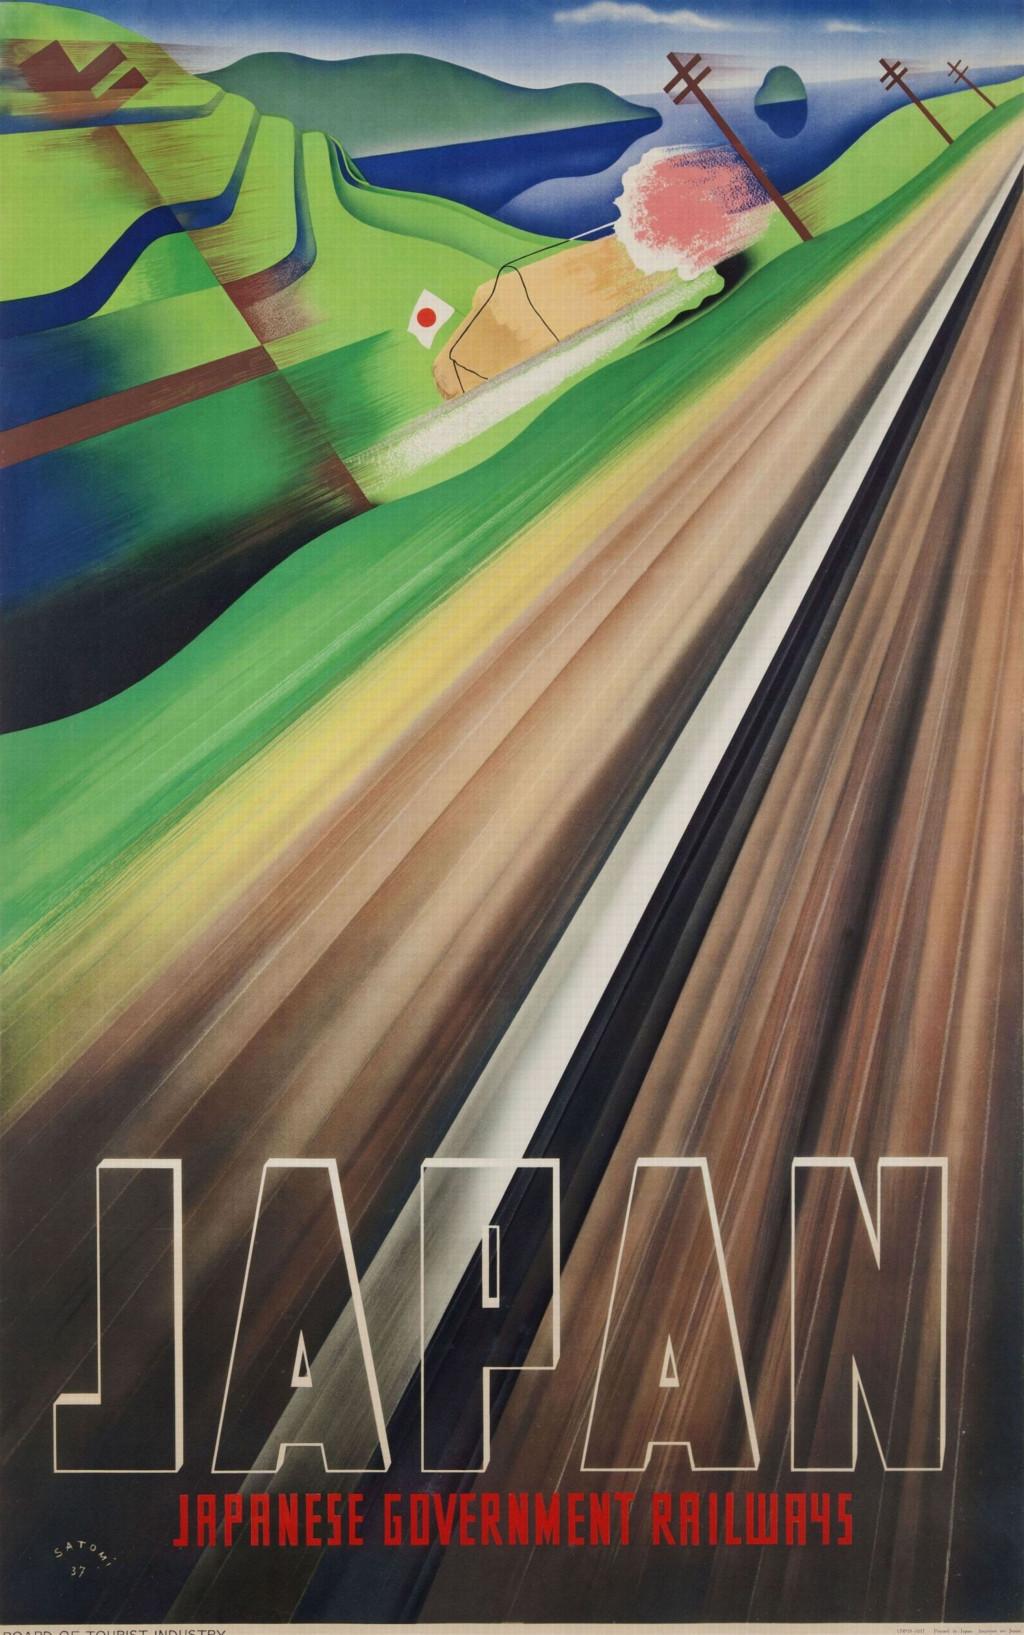 Muneji Satomi, 'Japan', 1937. Collectie Stedelijk Museum Amsterdam